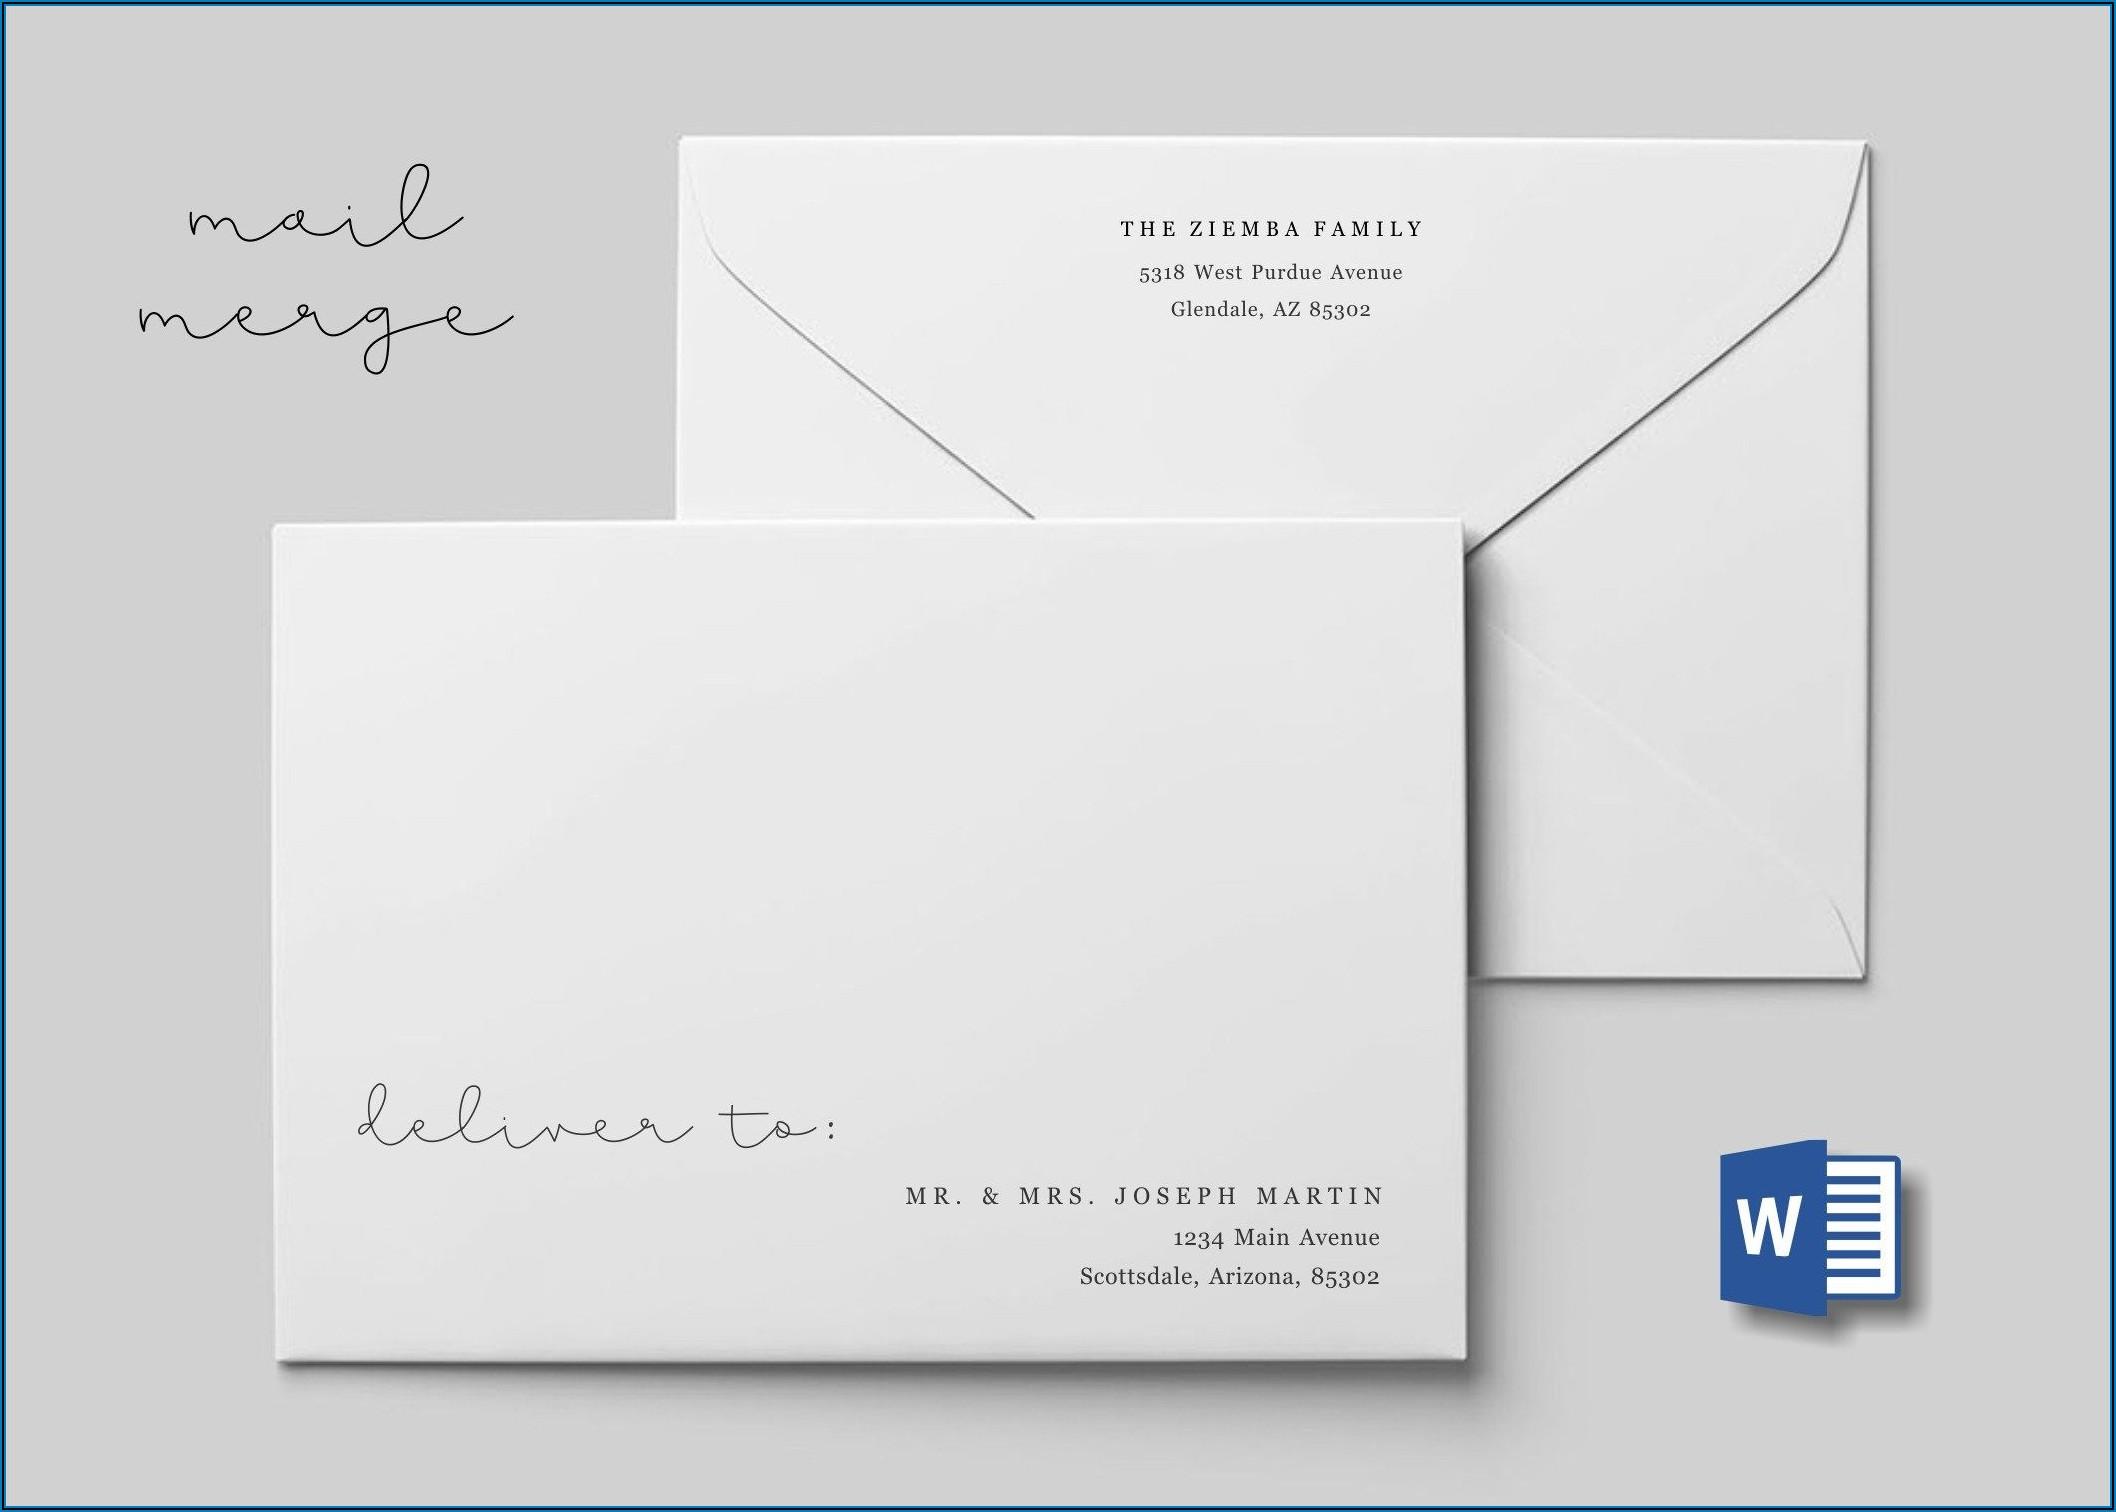 Template For Addressing Wedding Envelopes